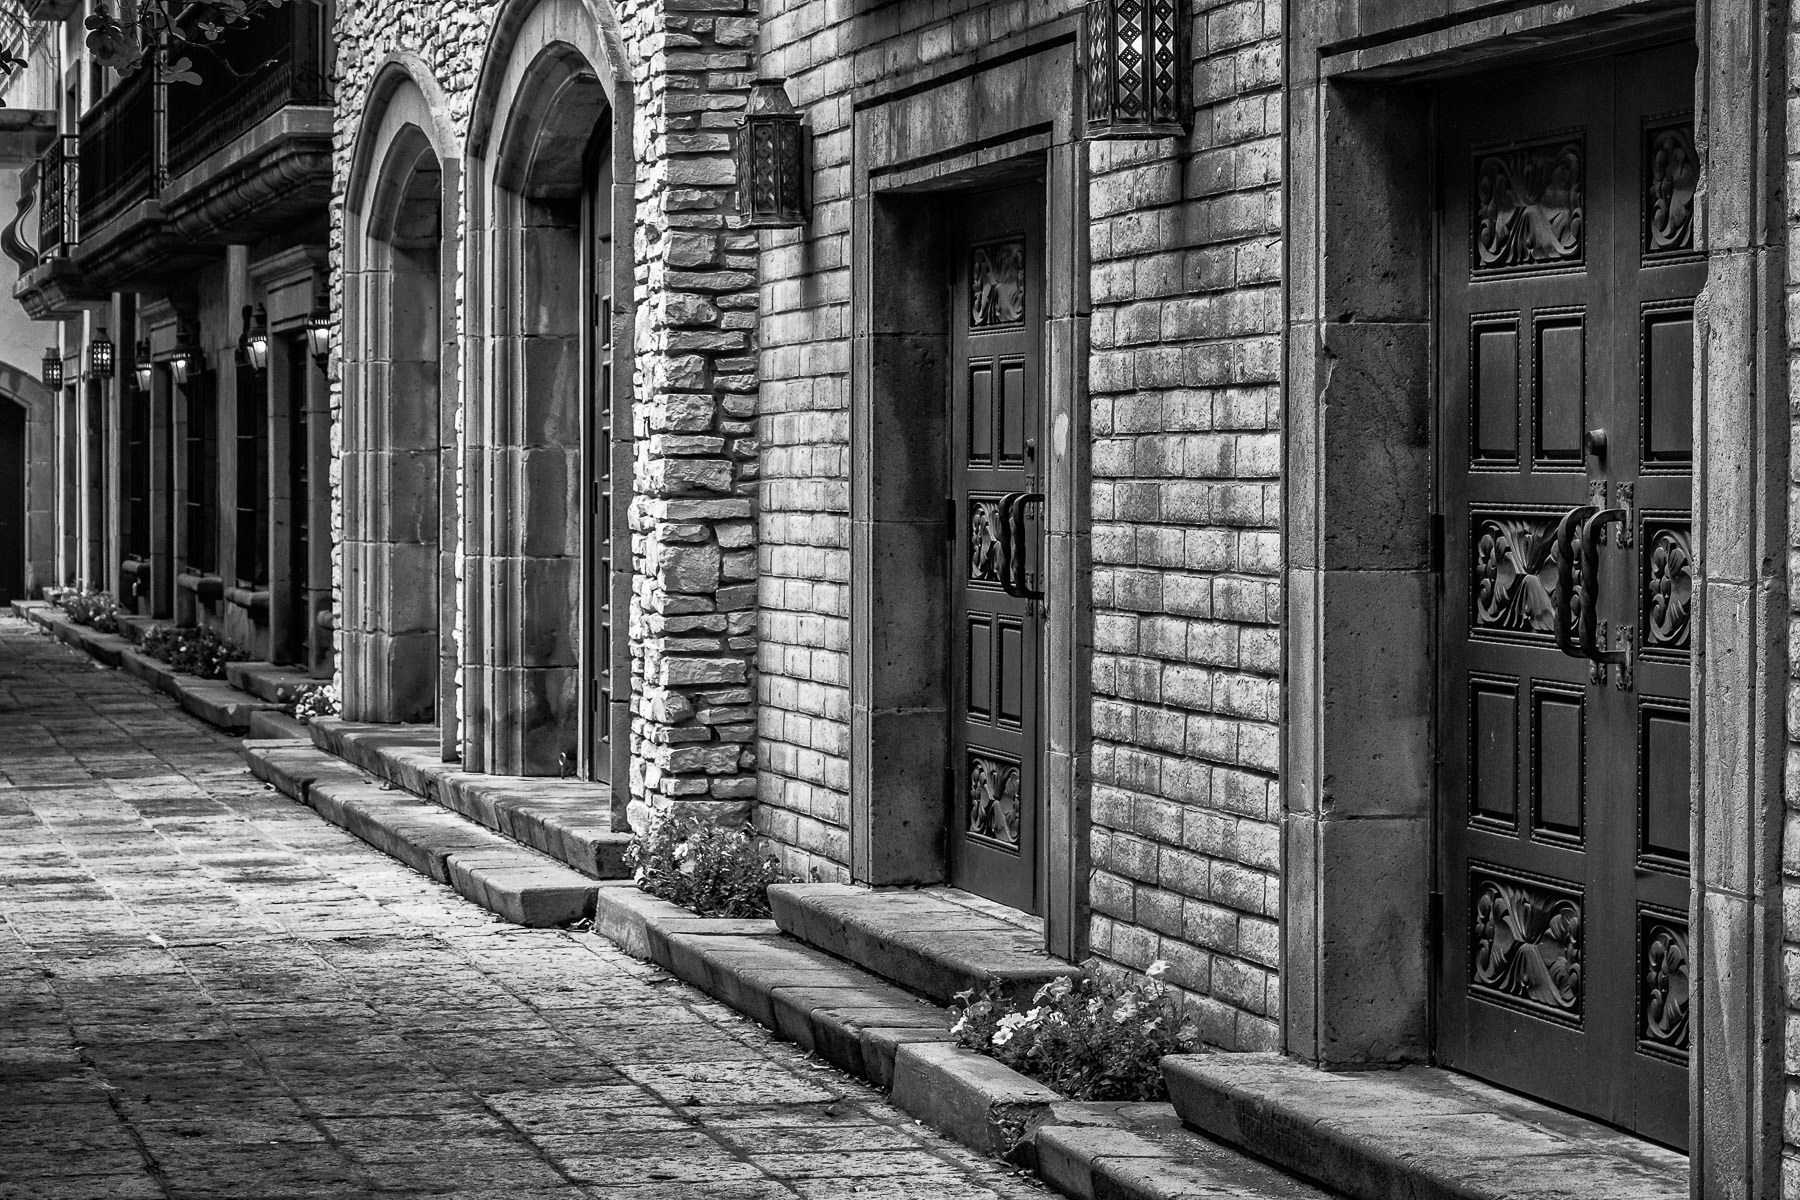 Wood doors along the Mandalay Canal, Las Colinas, Irving, Texas.